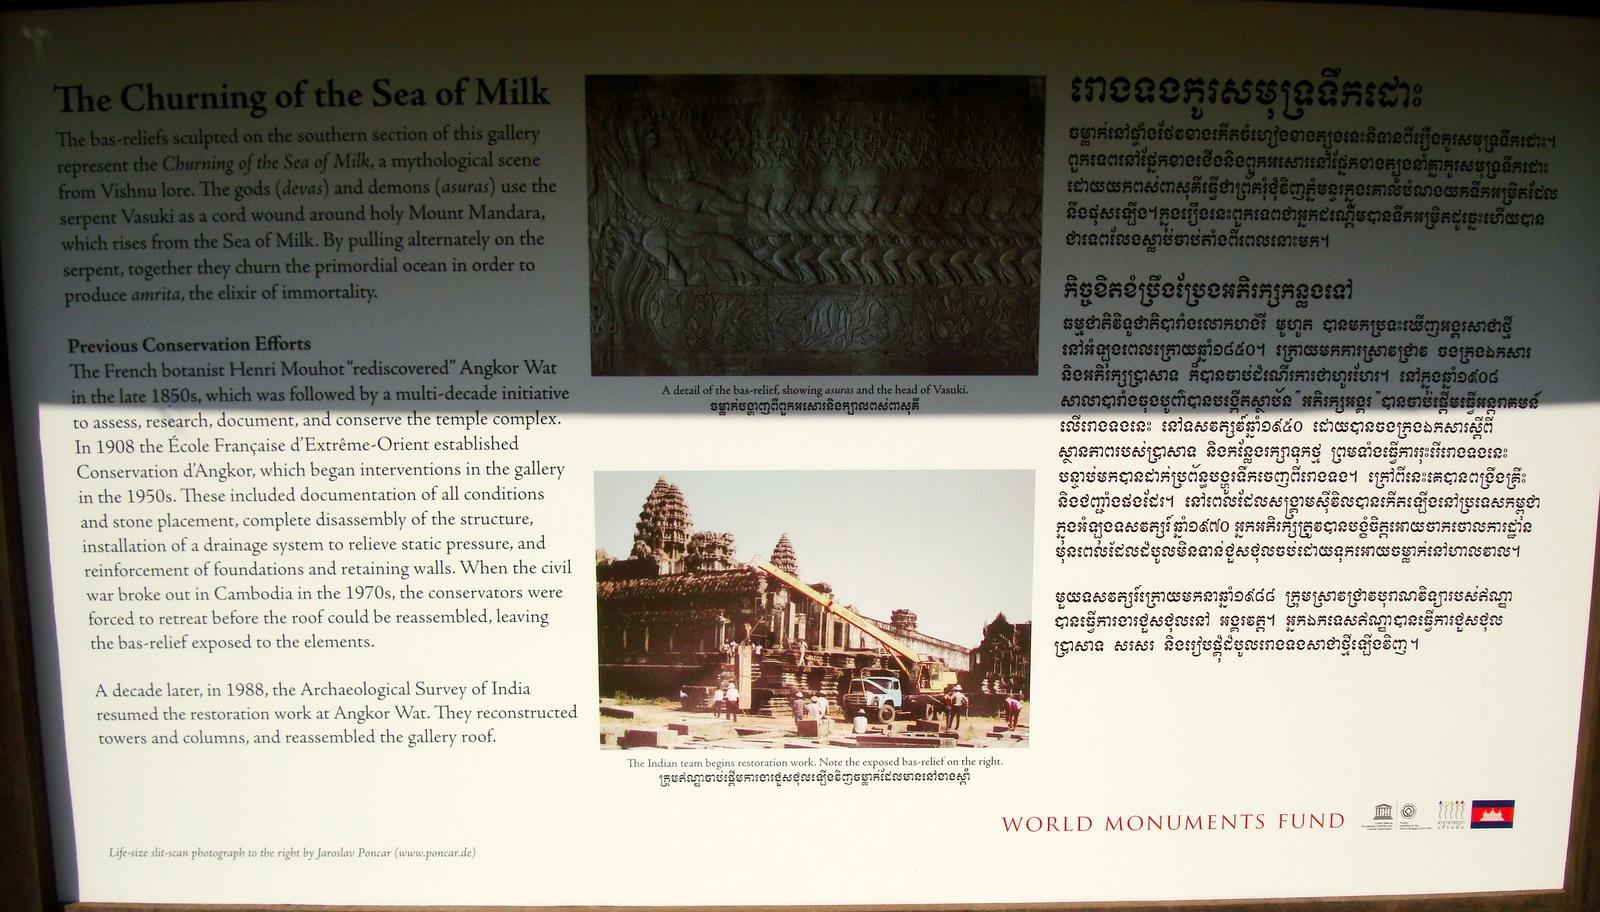 1 Angkor Wat notice board Churning of